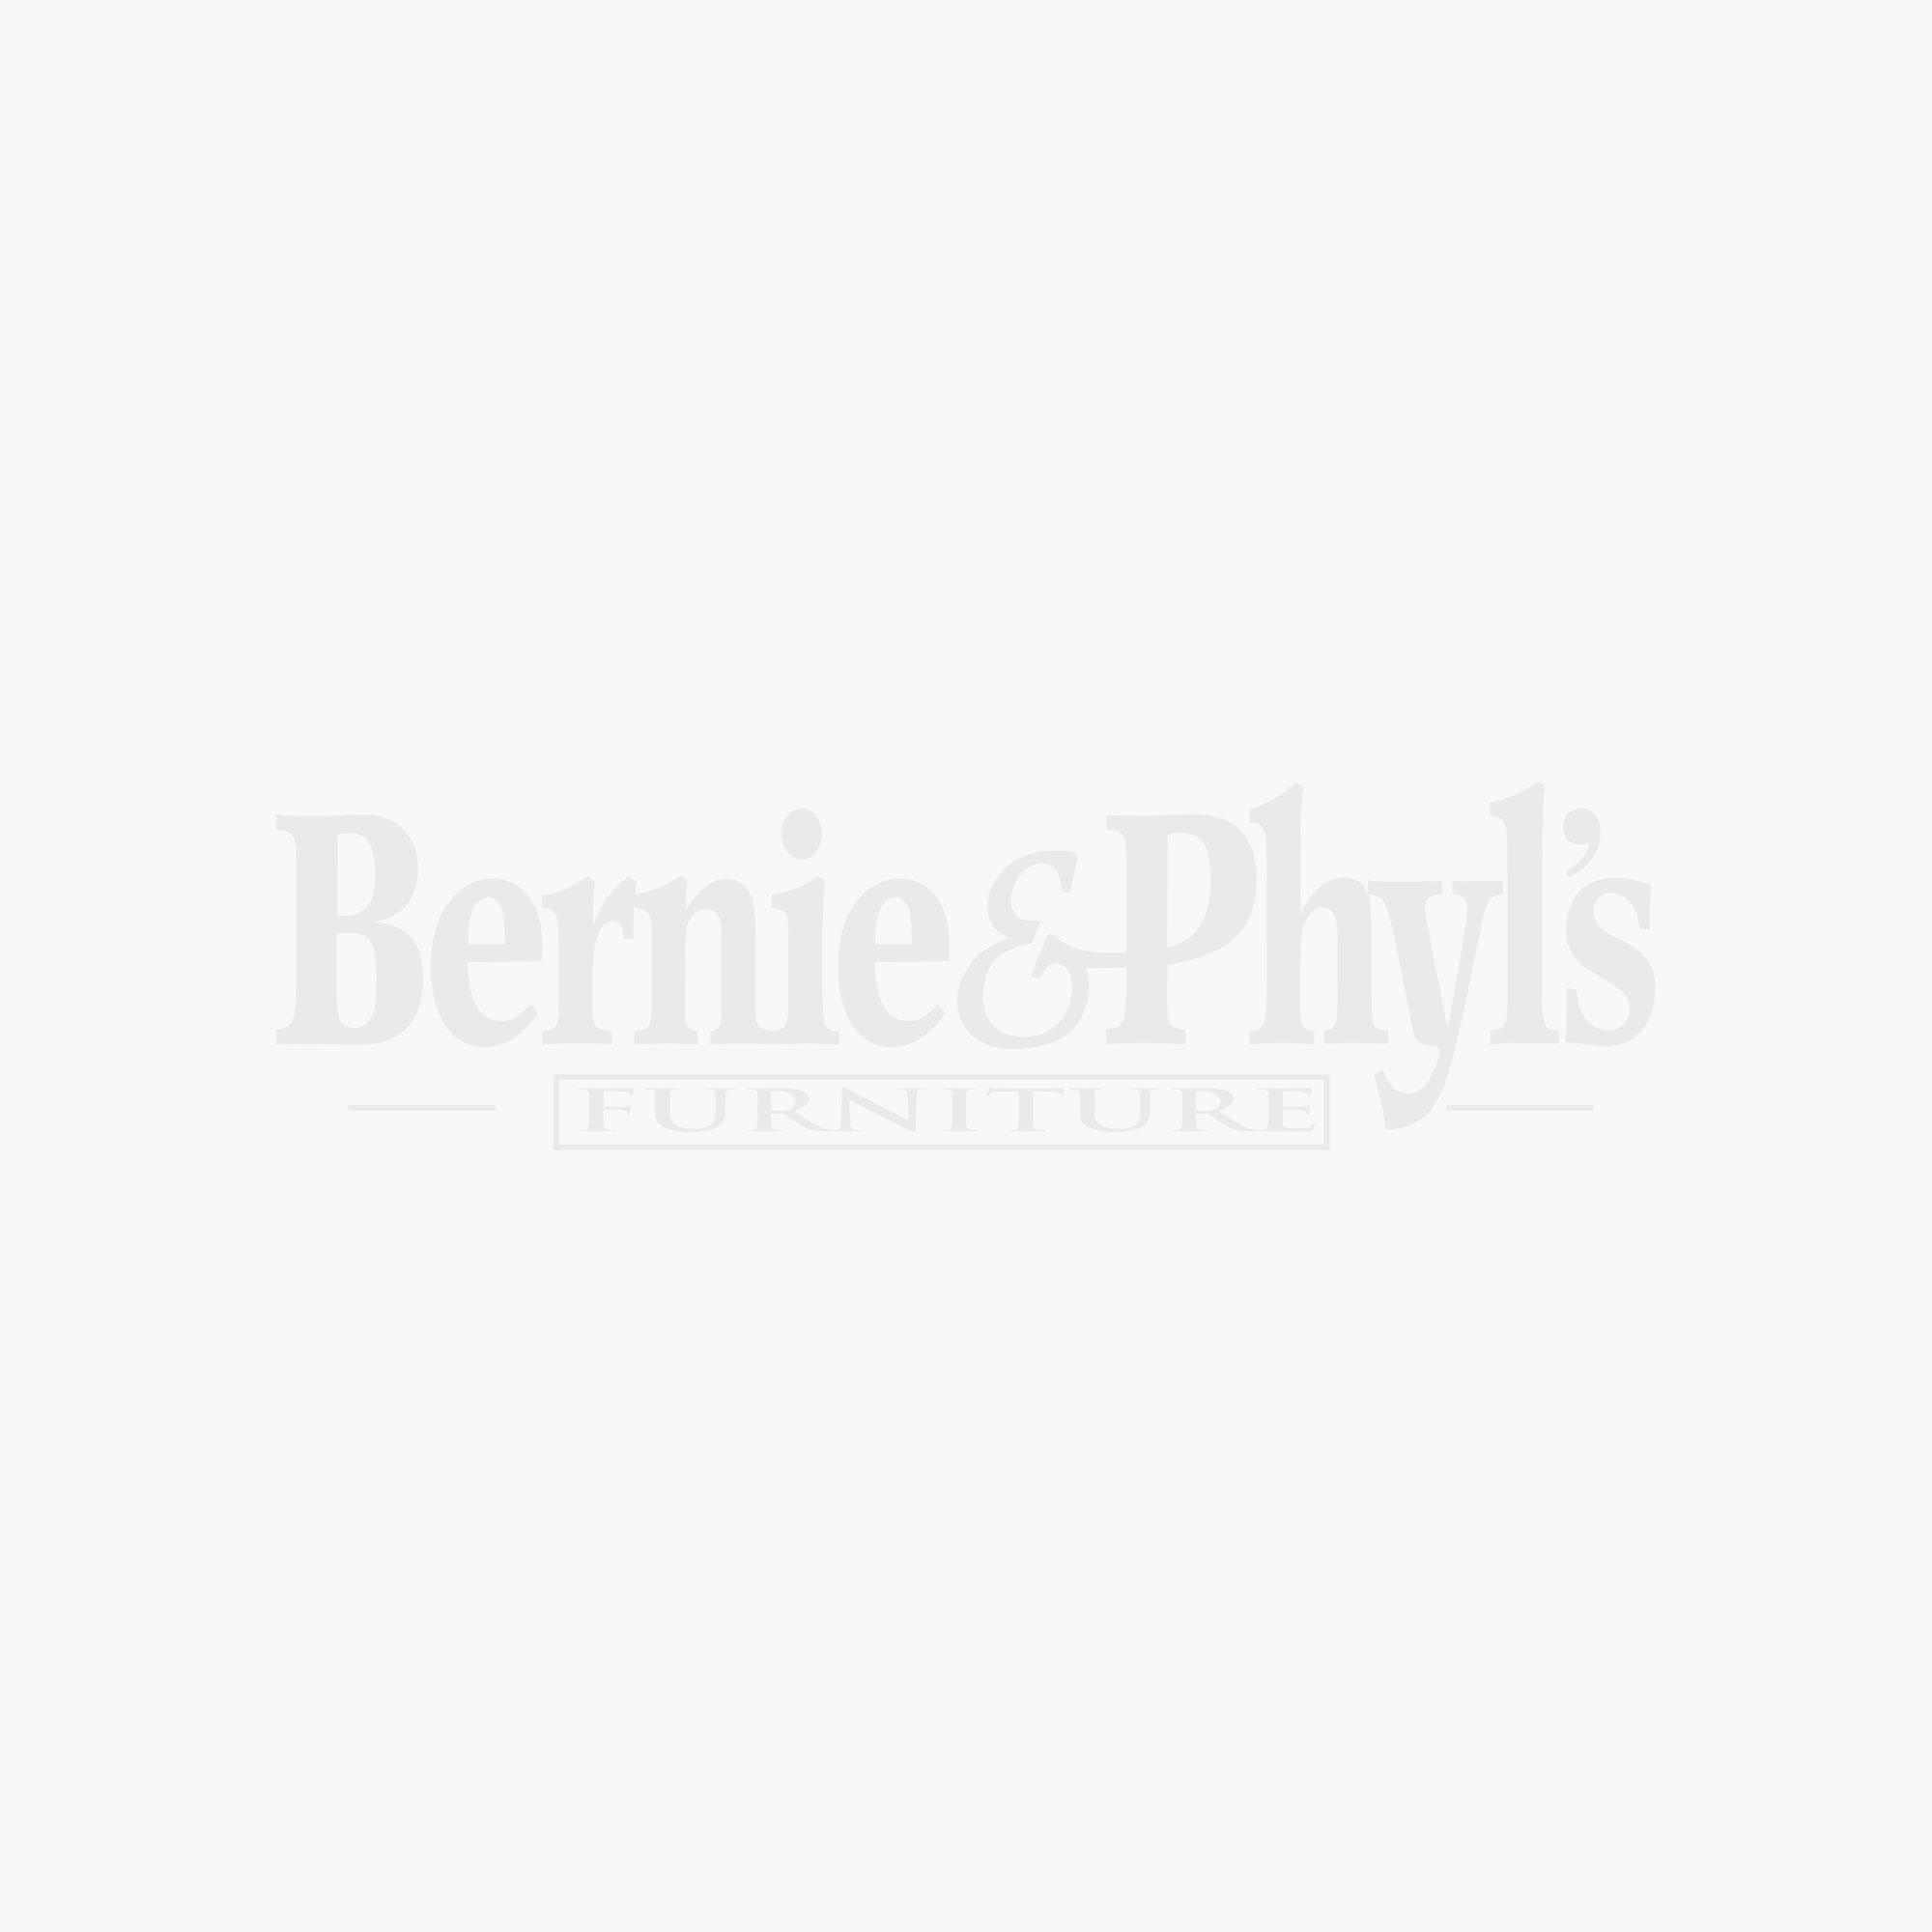 Hatsuko Rectangular End Table Dark Brown Set Of 1 T864 3 By Ashley Furniture Signature